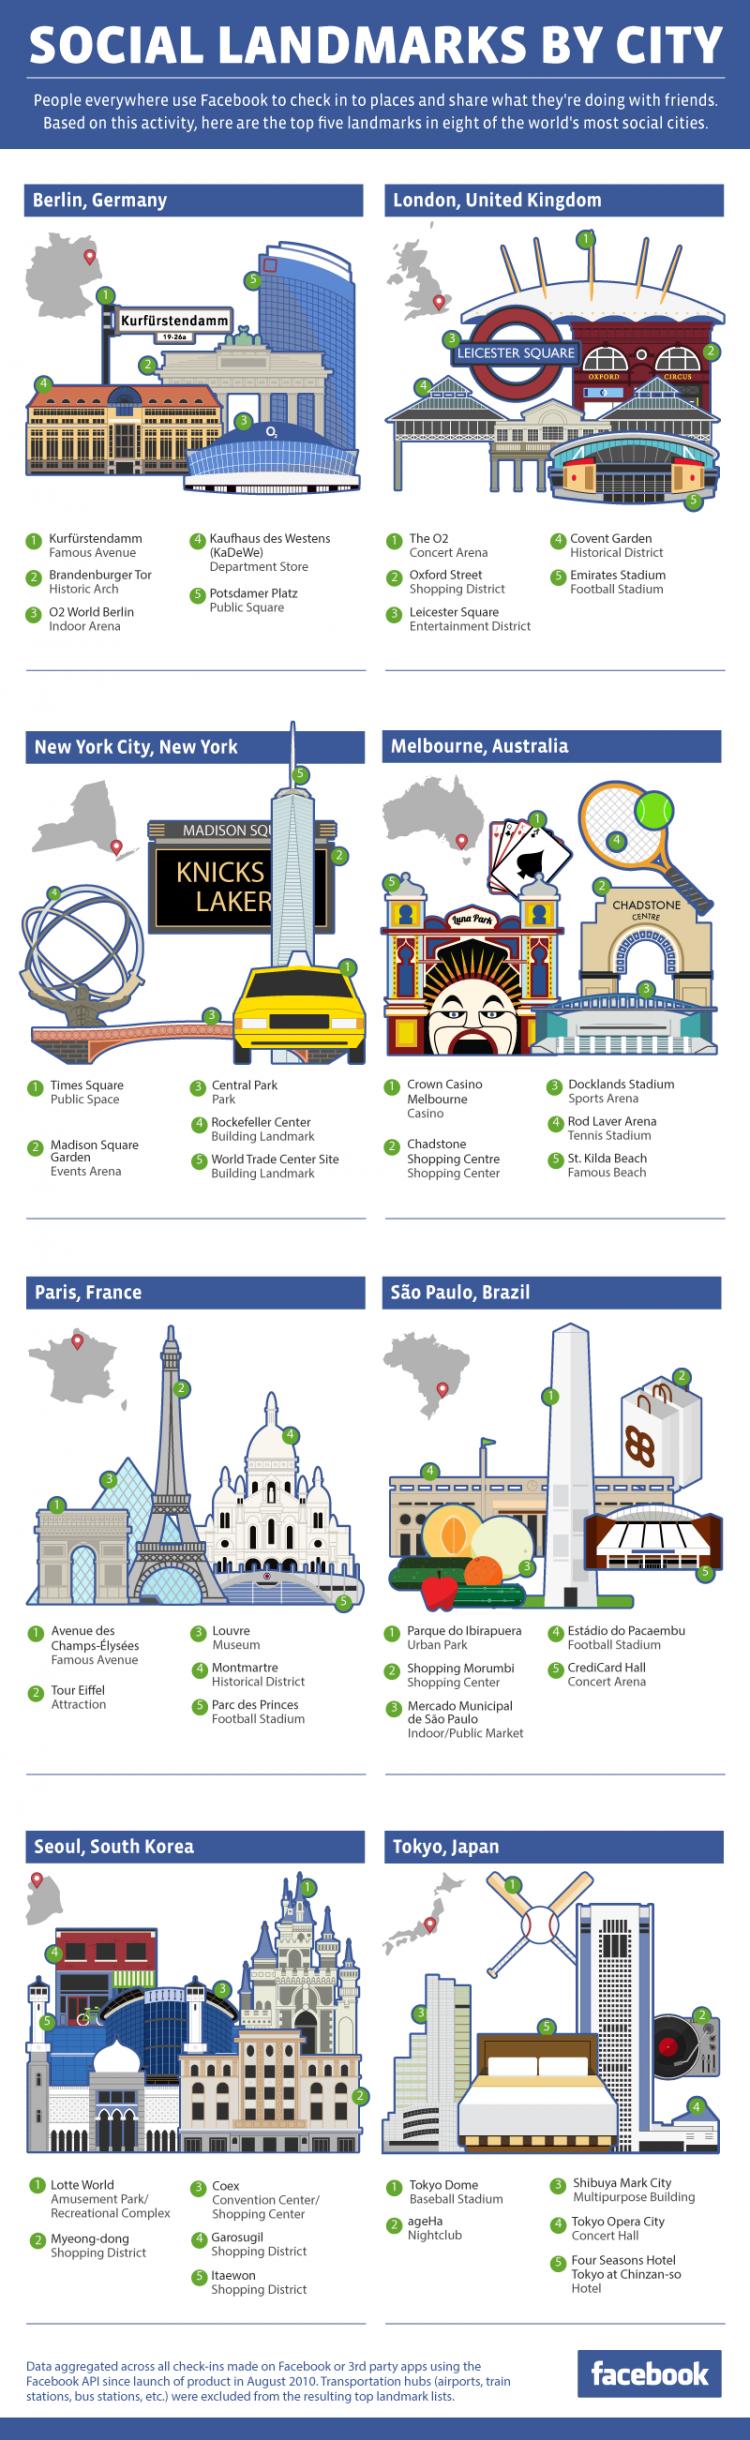 FB citylandmarks 750x2440 Facebooks Most Social Landmarks By City